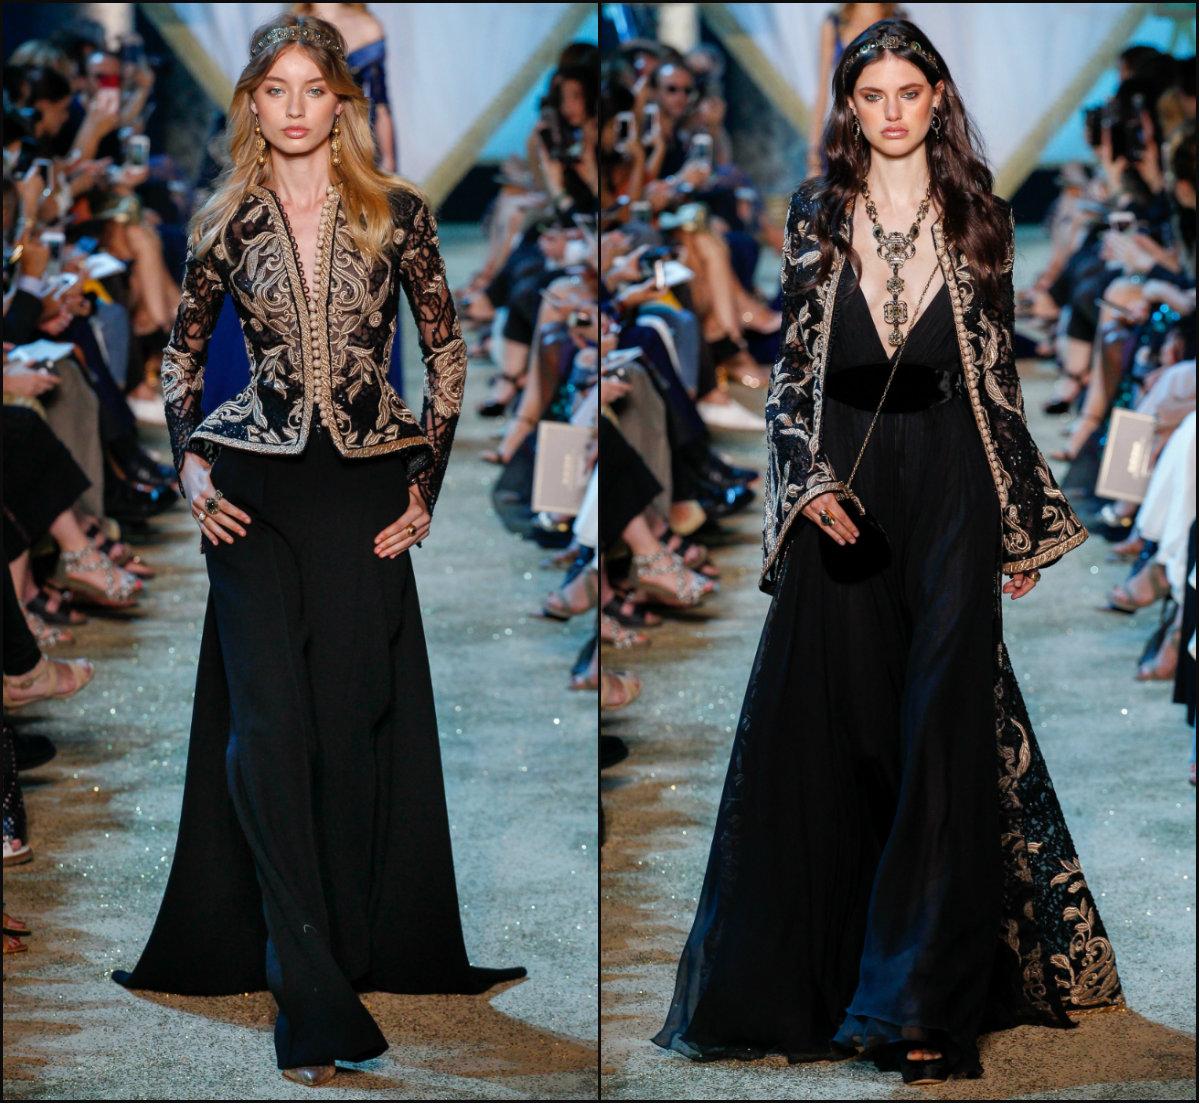 Elie Saab wavy mid part hairstyles 2017 Fall Couture Week